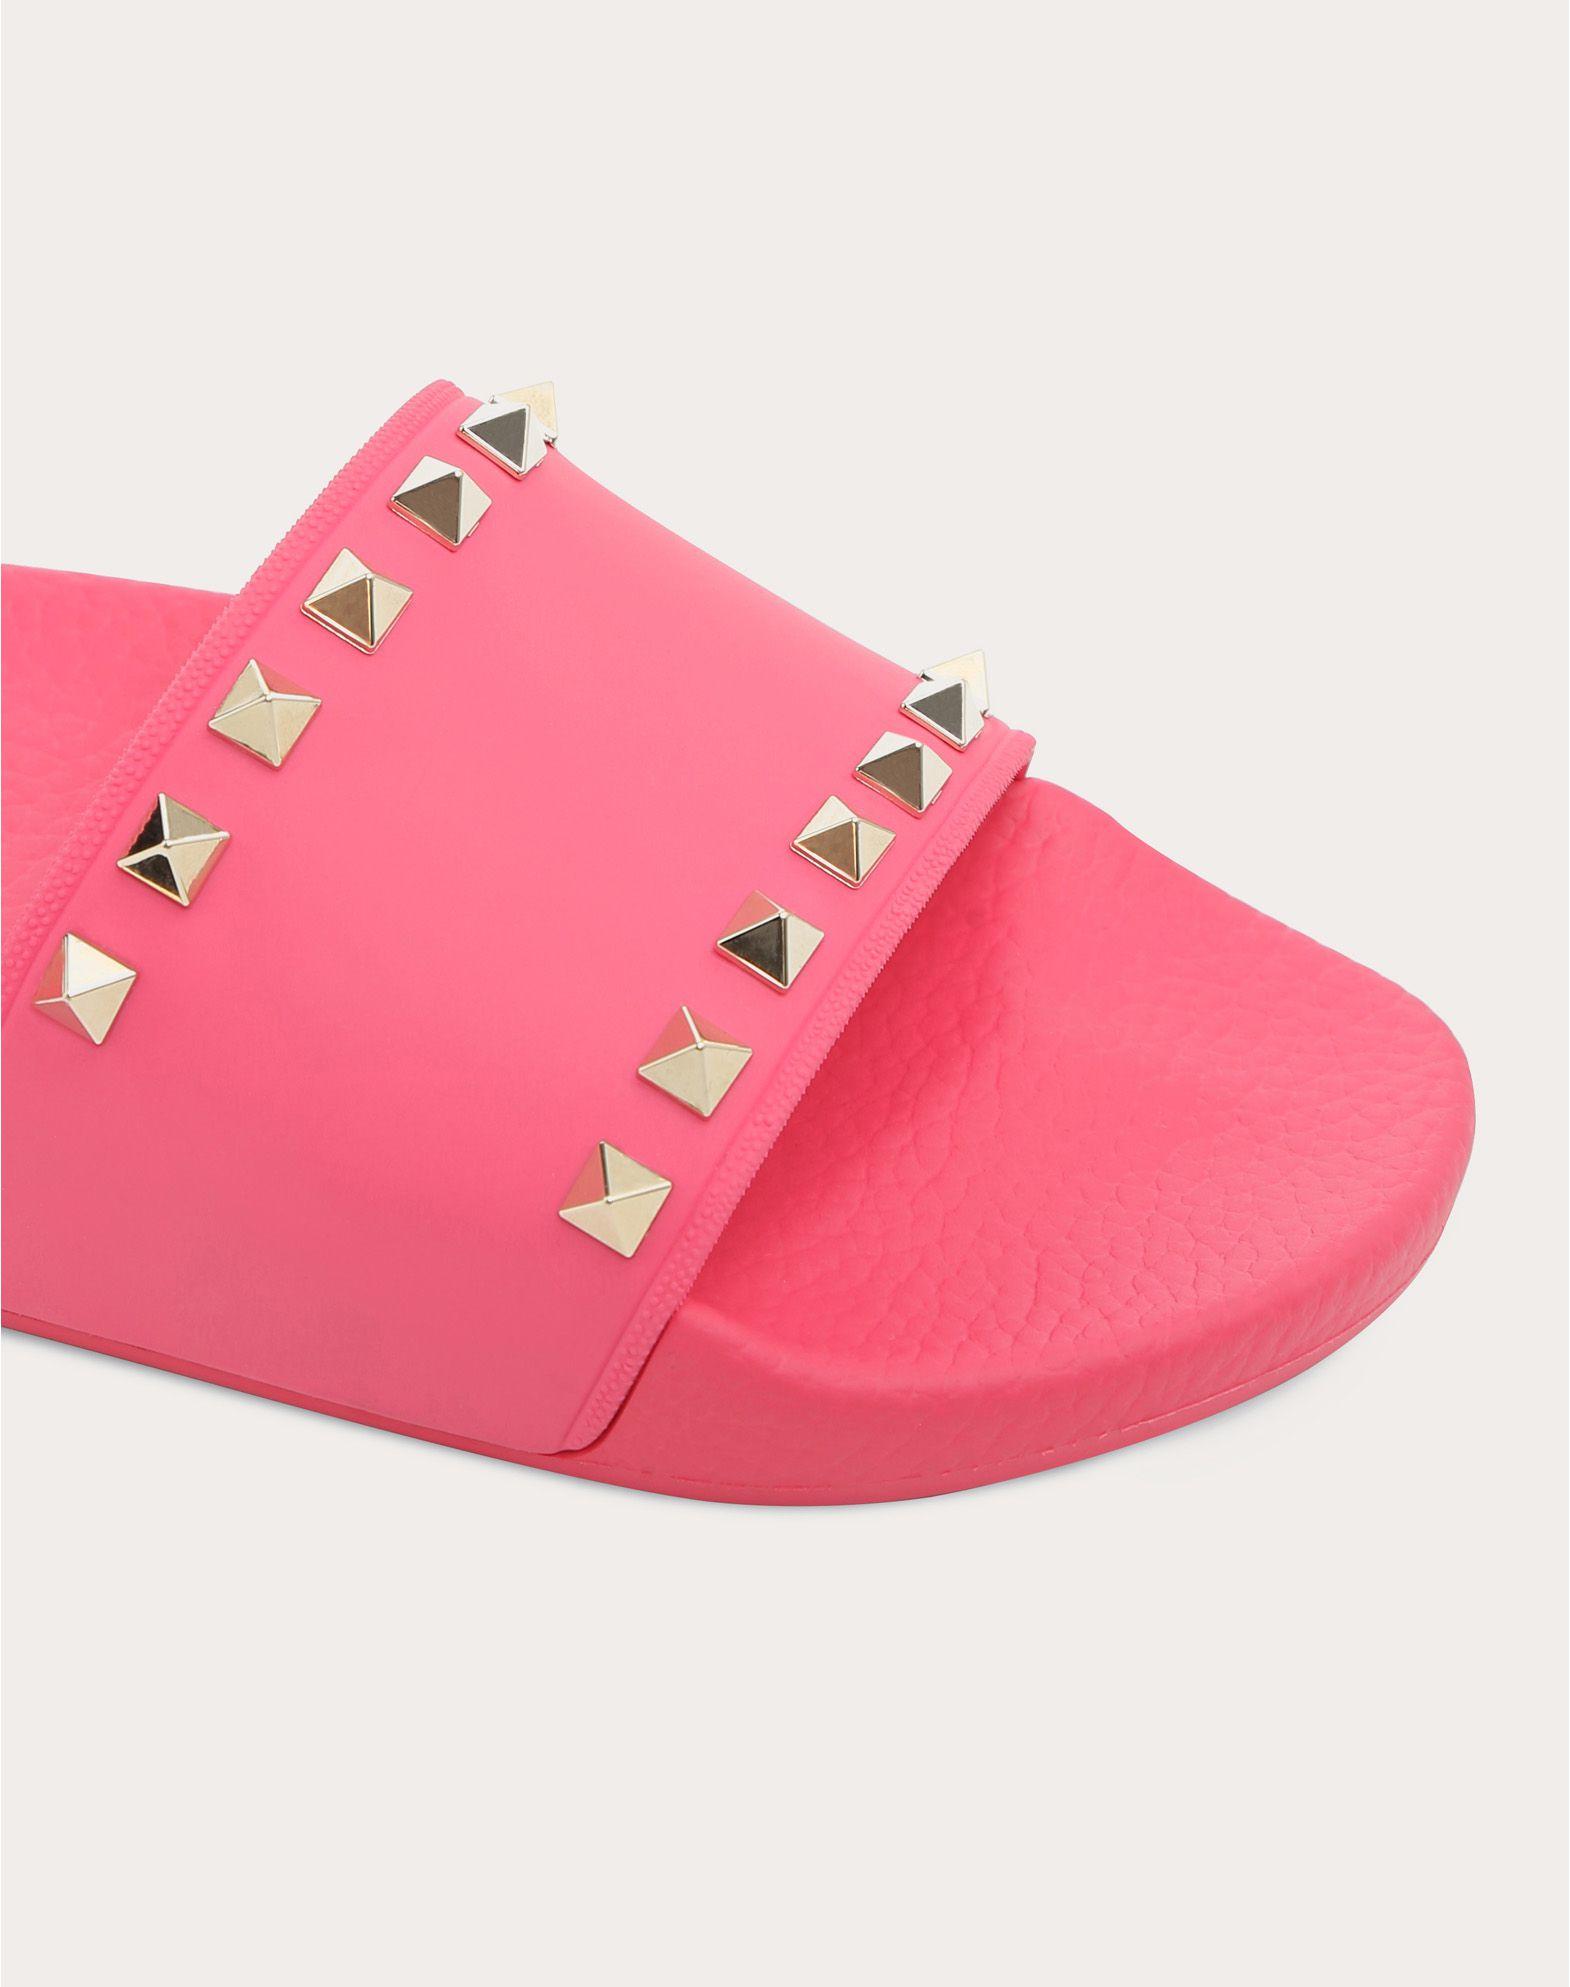 VALENTINO GARAVANI Rockstud PVC Slide Sandal SLIDE SANDAL D a